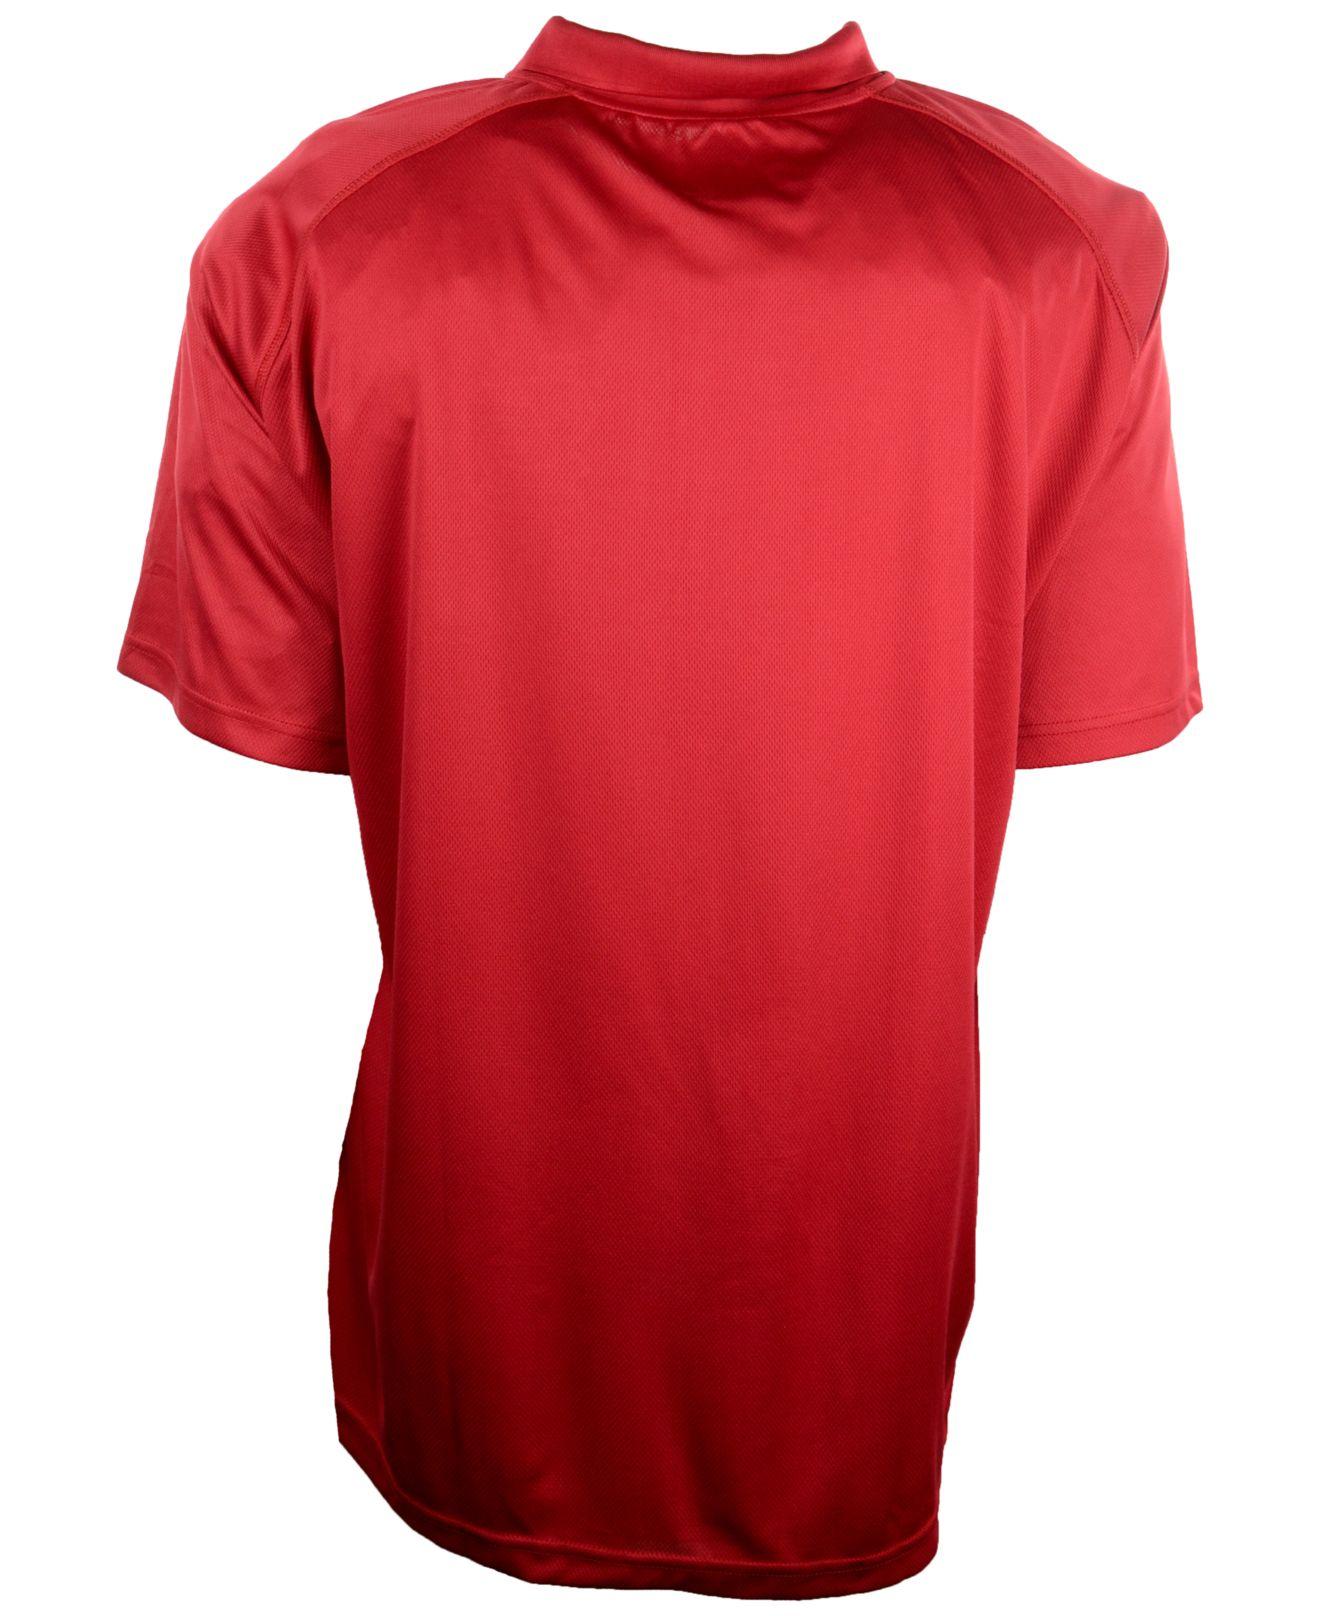 Majestic Big Tall Short Sleeve St Louis Cardinals